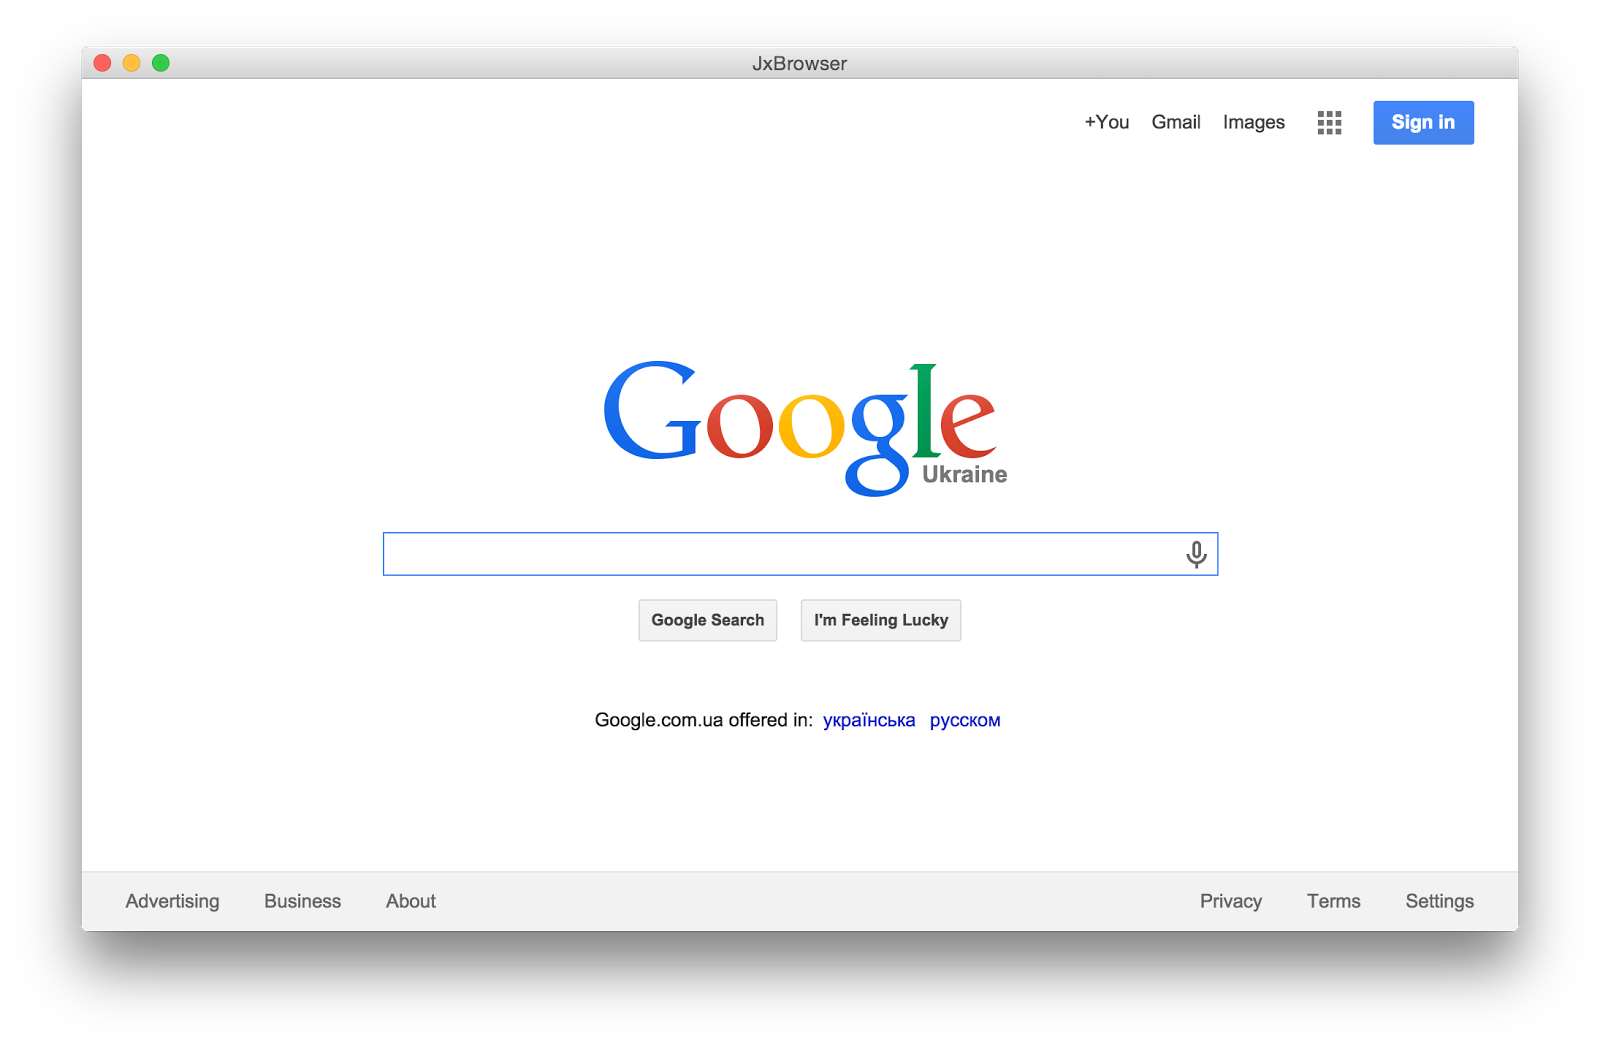 Cross-Desktop Apps : JxBrowser